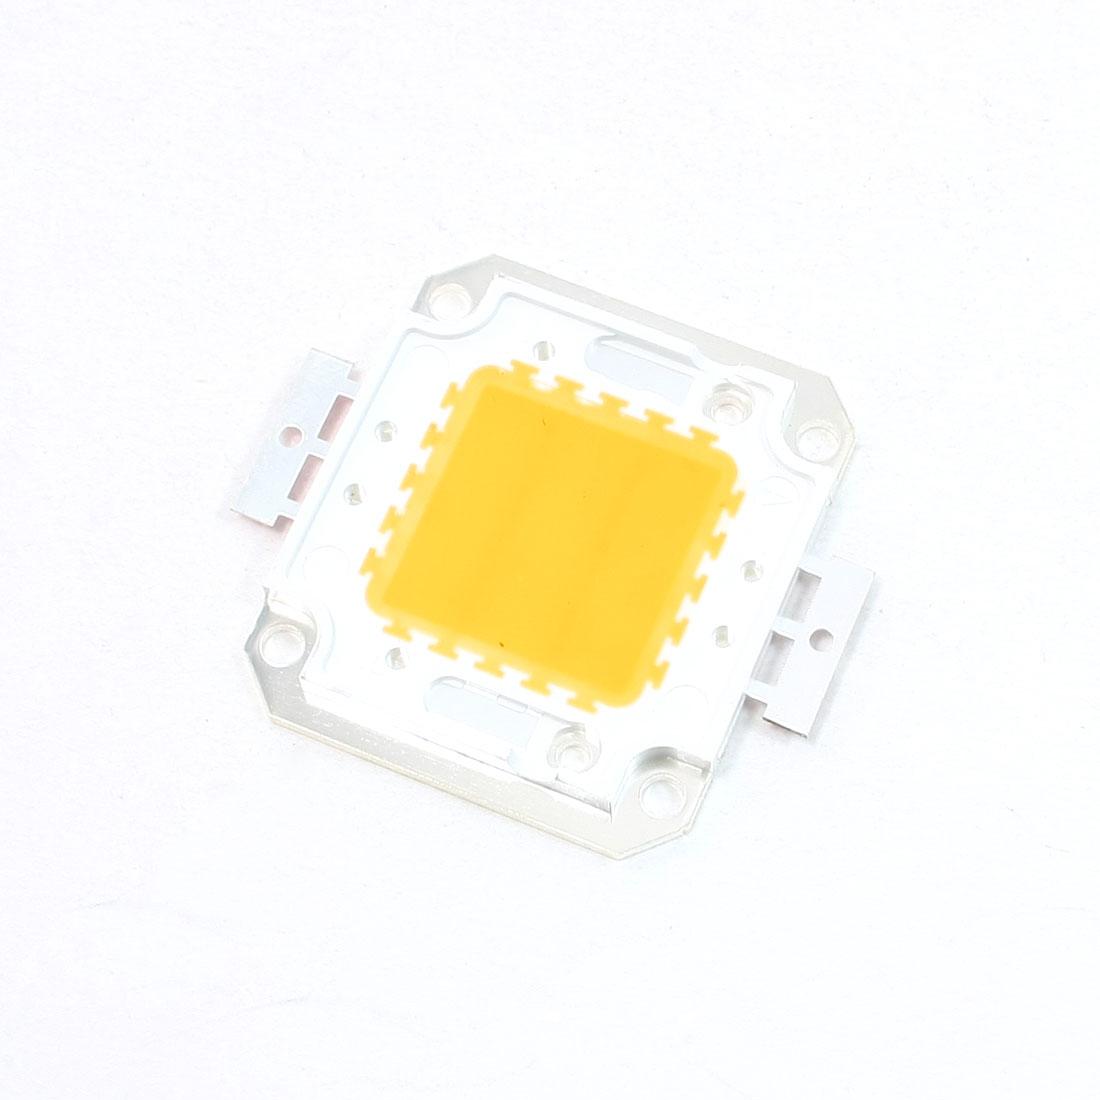 1500-2500LM 2850-3150K 20W High Power Warm White 2x10 IC LED Lamp Blub Beads